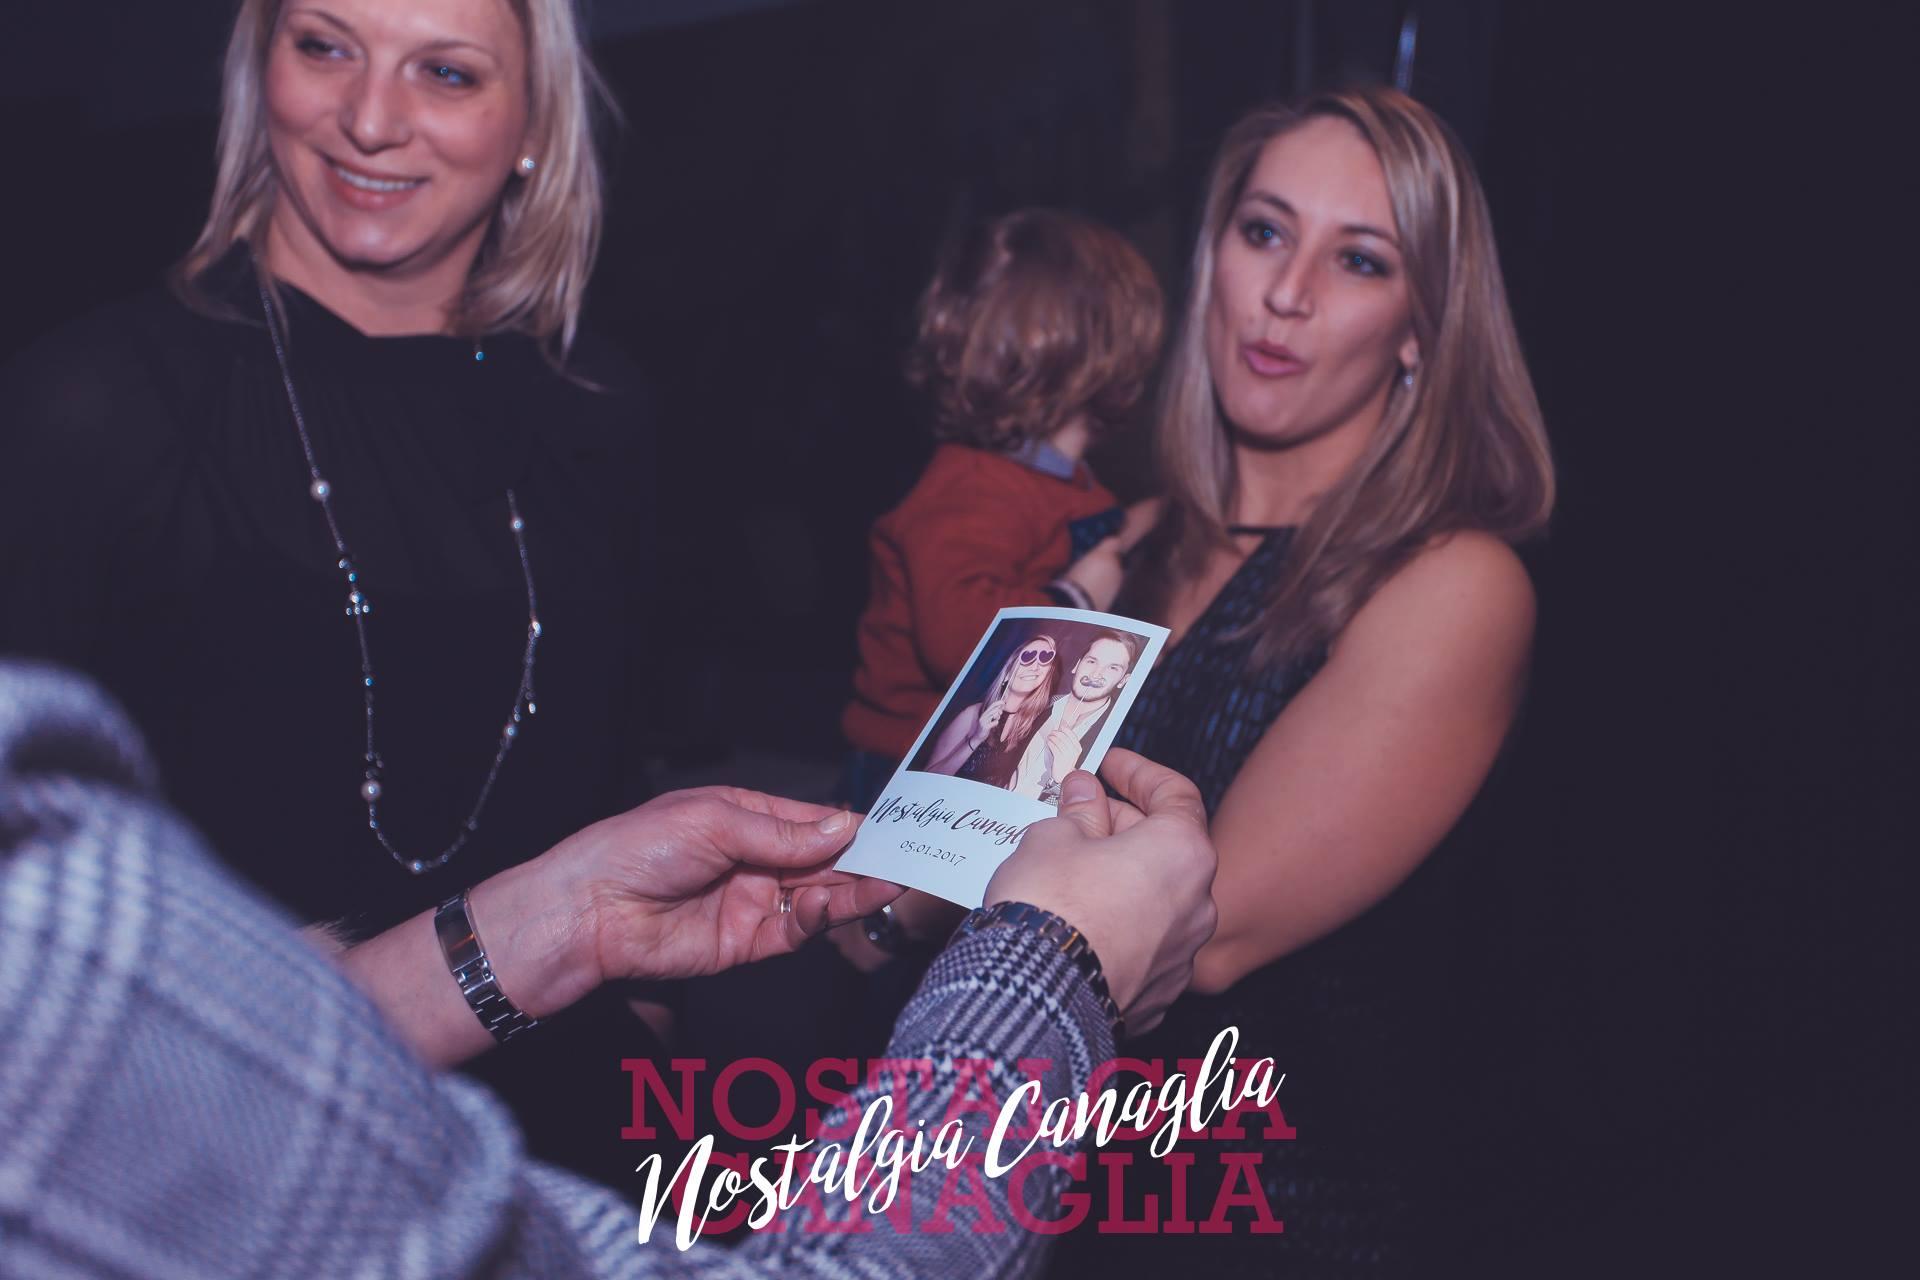 nostalgia-canaglia-glam-club-photobooth-polaroid-1